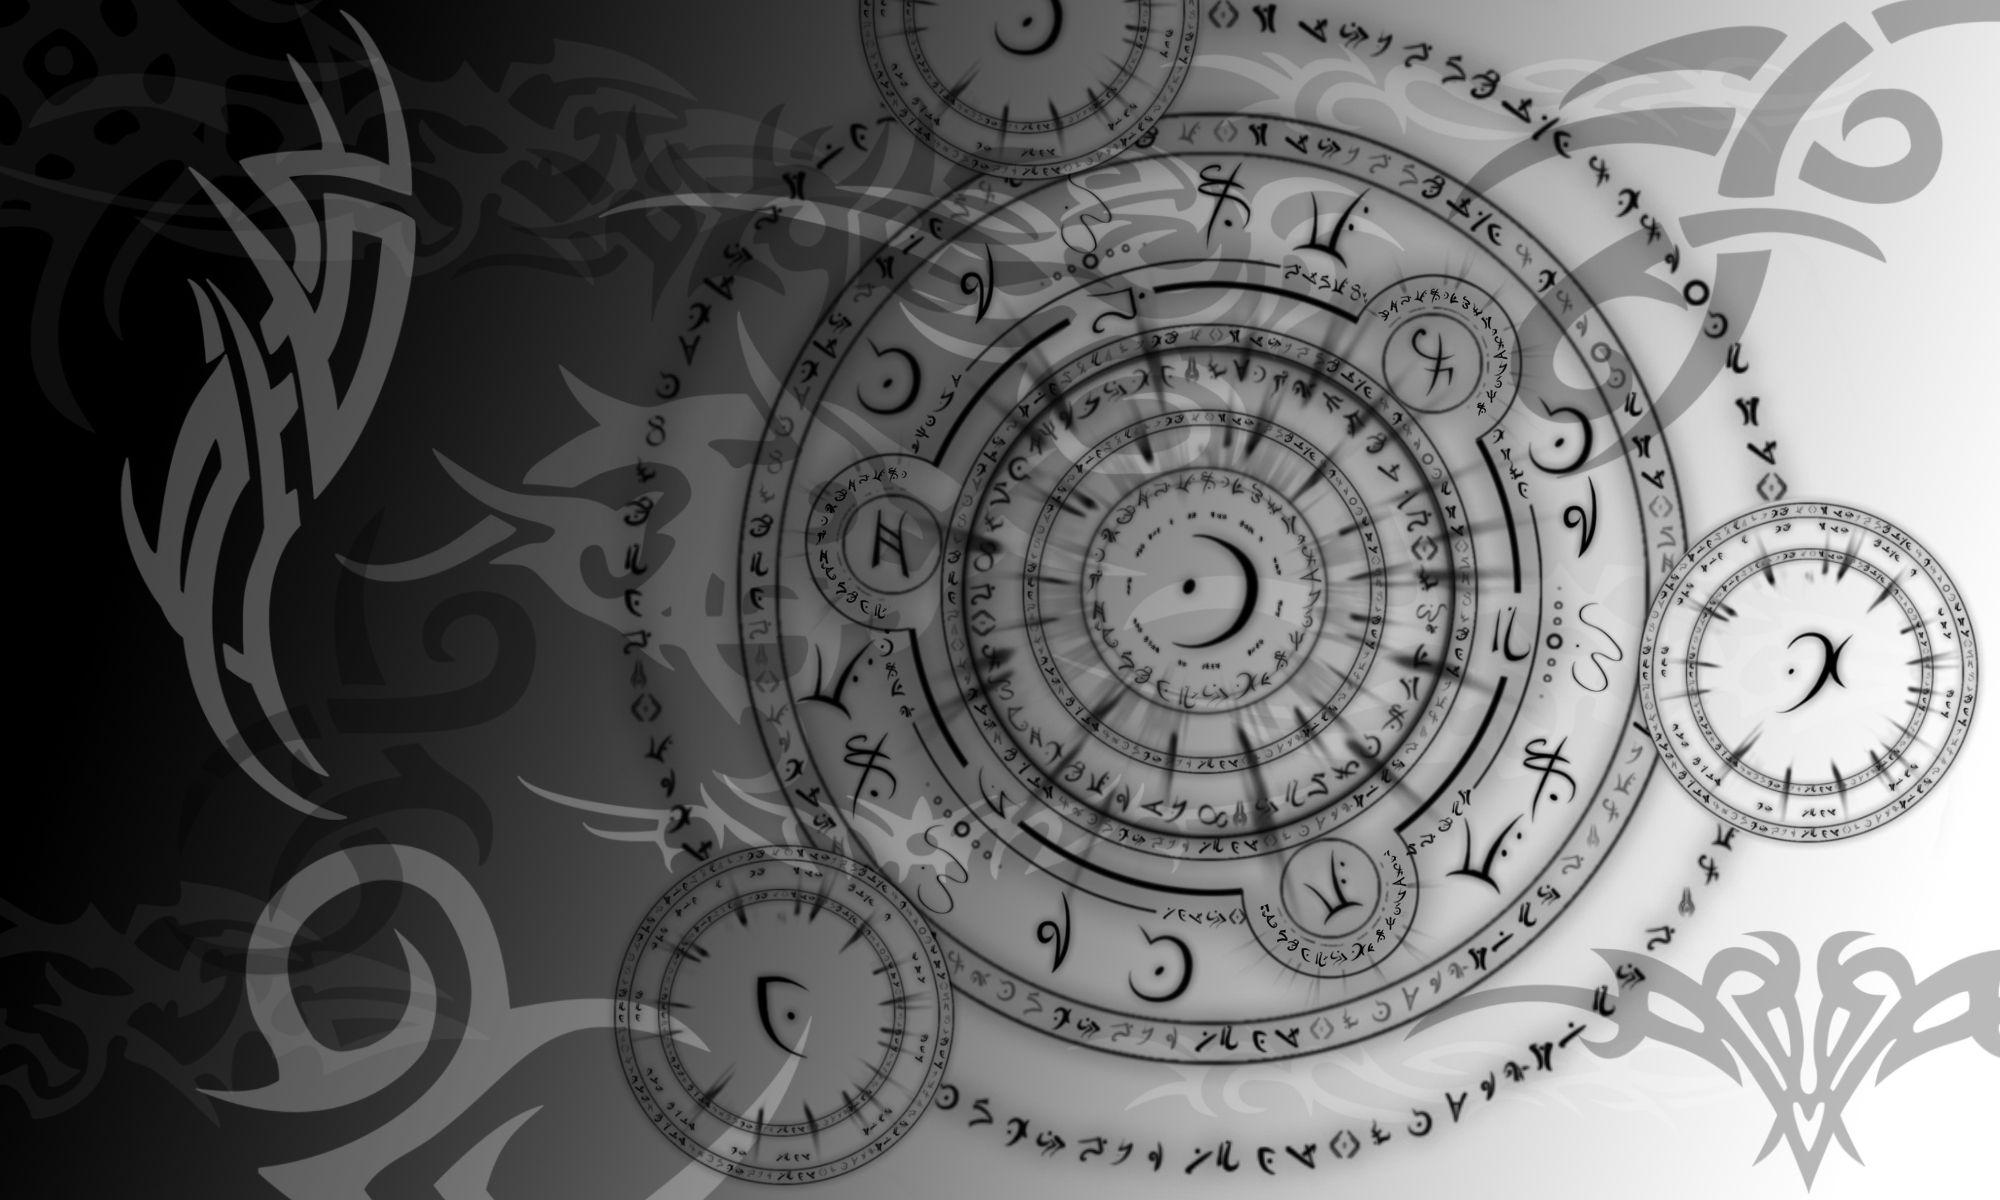 Black magic symbols wallpapers download arabesque black and white black magic symbols wallpapers download arabesque black and white circle magic symbol biocorpaavc Images